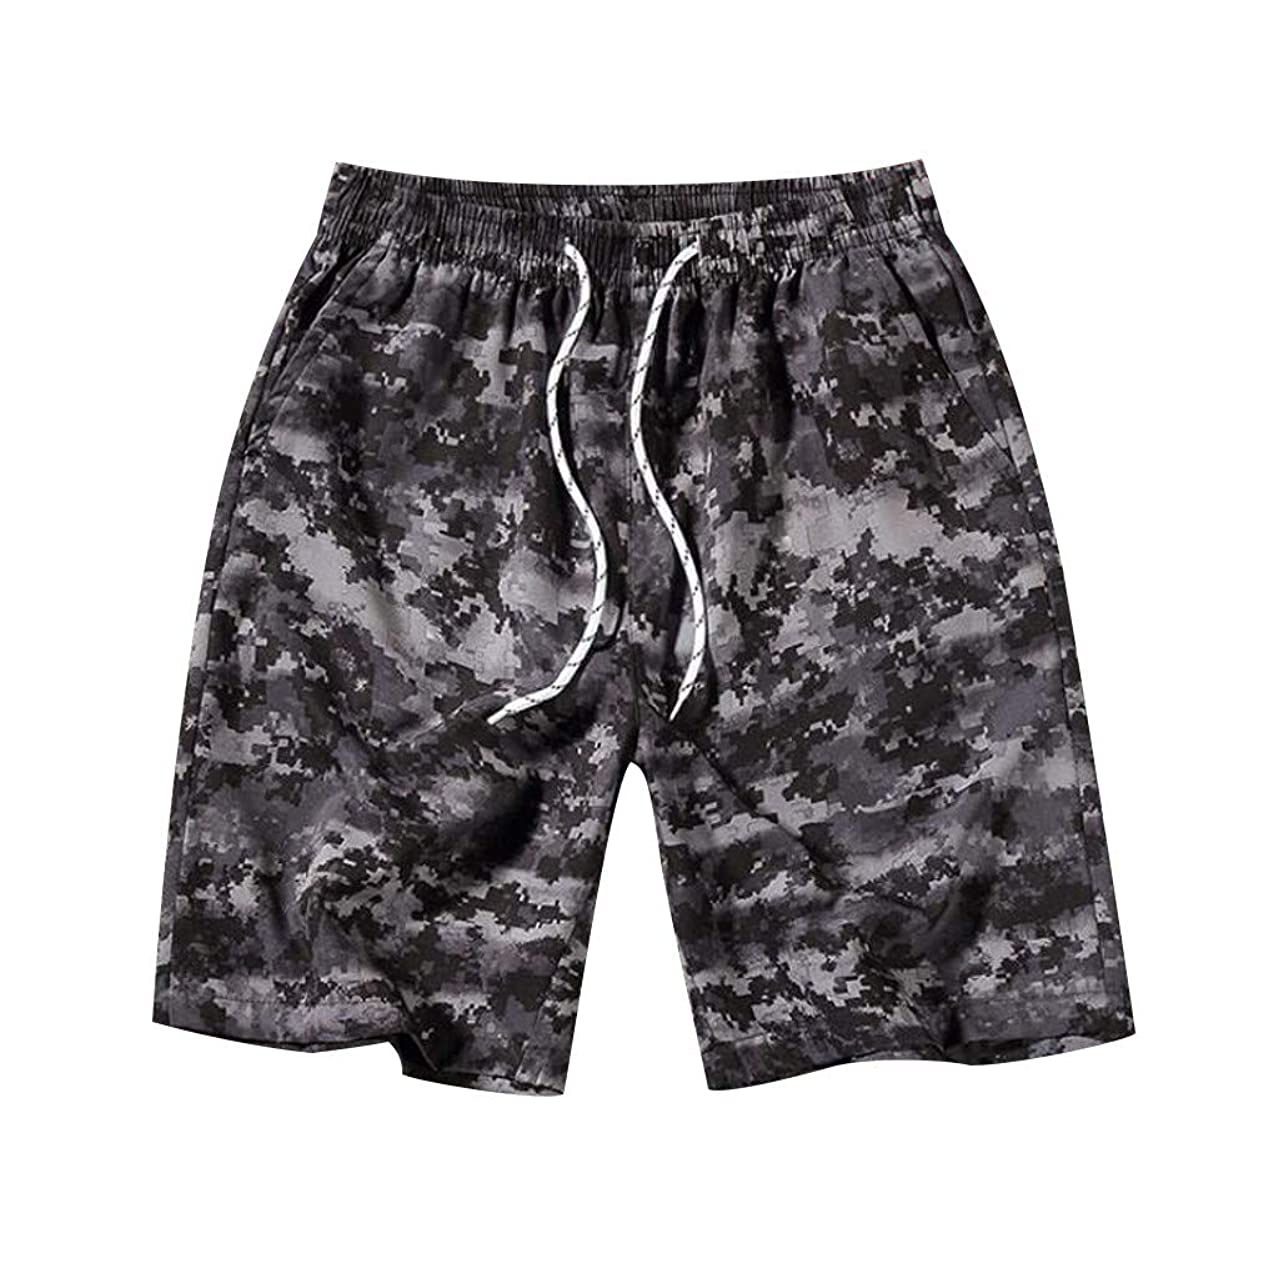 JULYKI Mens Swimsuit Swim Trunks Drawstring Elastic Waist Beach Shorts Hawaiian Boardshorts Quick Dry Bathing Suit